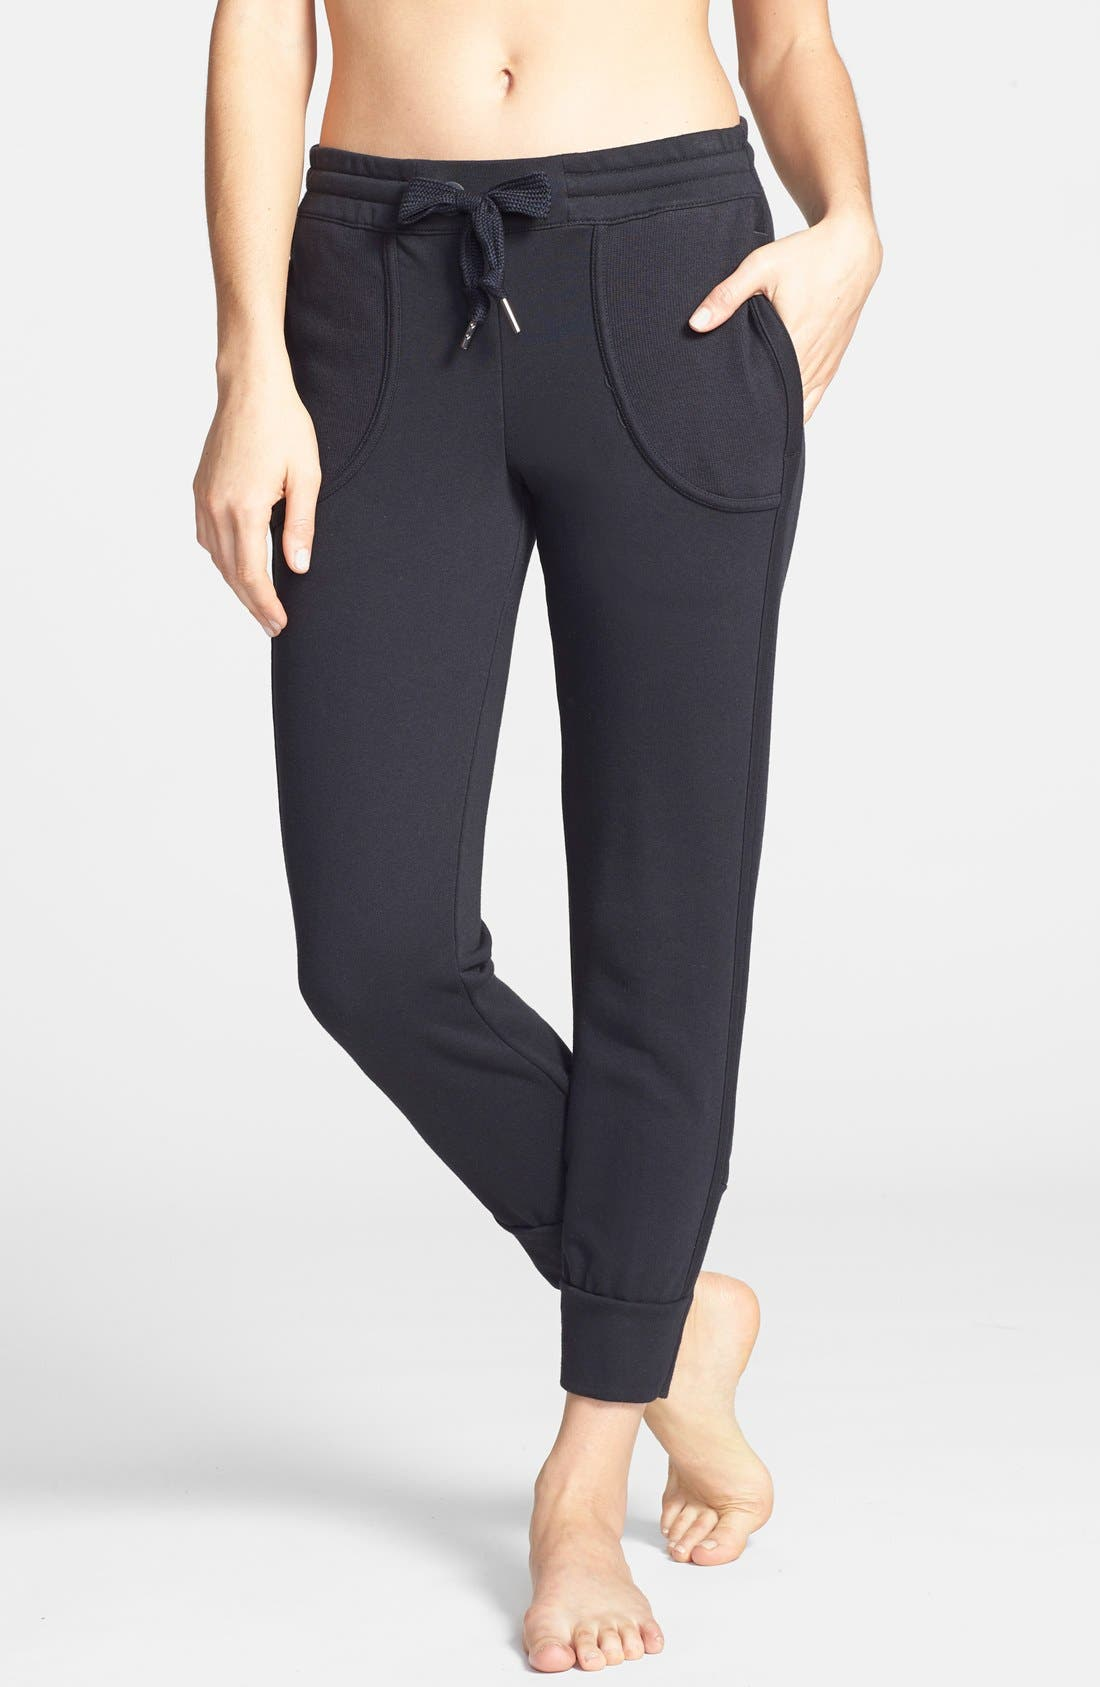 Alternate Image 1 Selected - adidas by Stella McCartney 'Essentials' Sweatpants